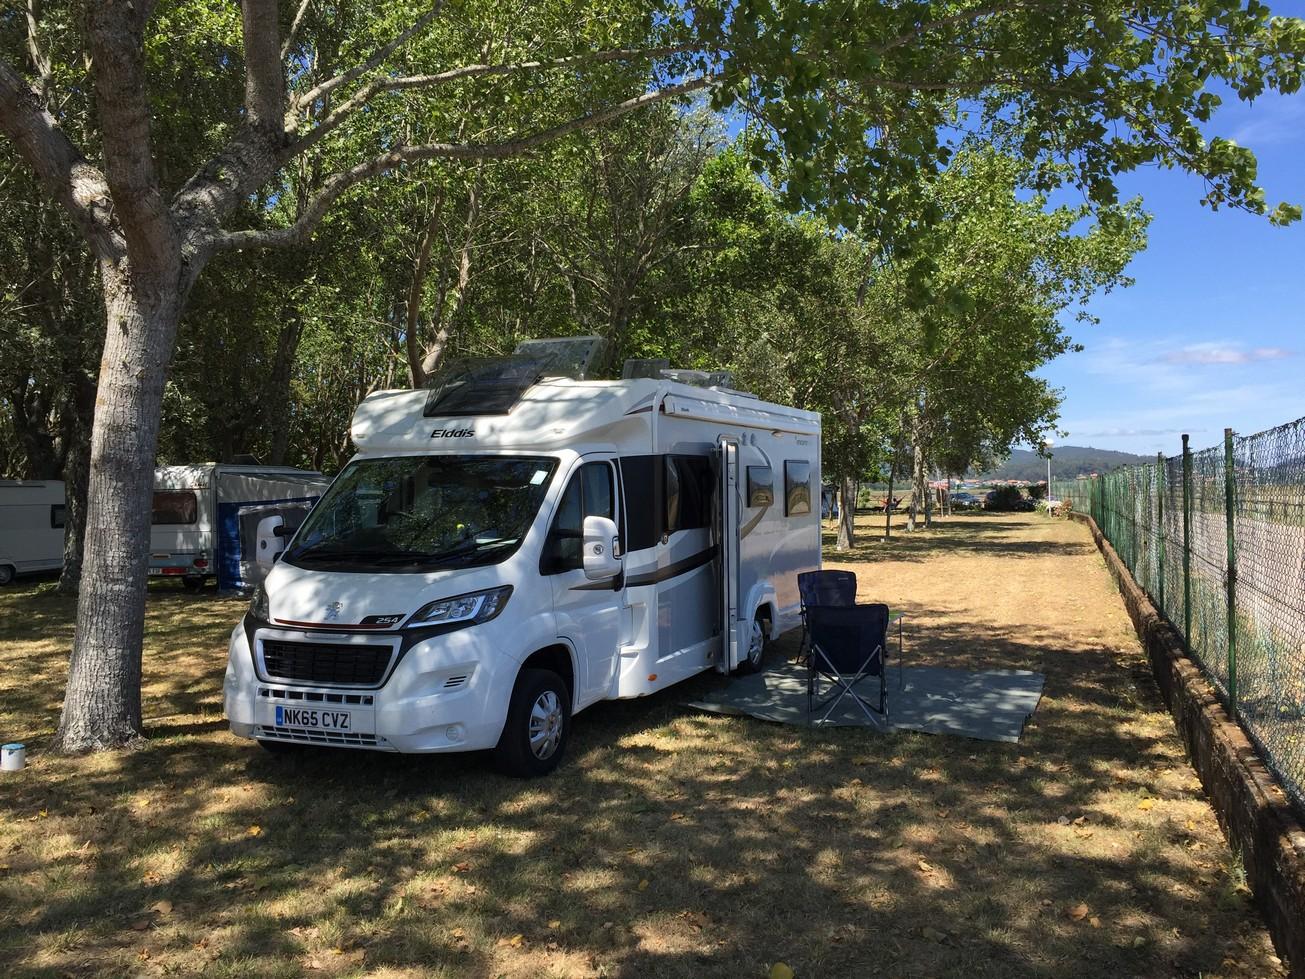 072 Camping Santa Tecla, A Guarda, Spain, Campsite